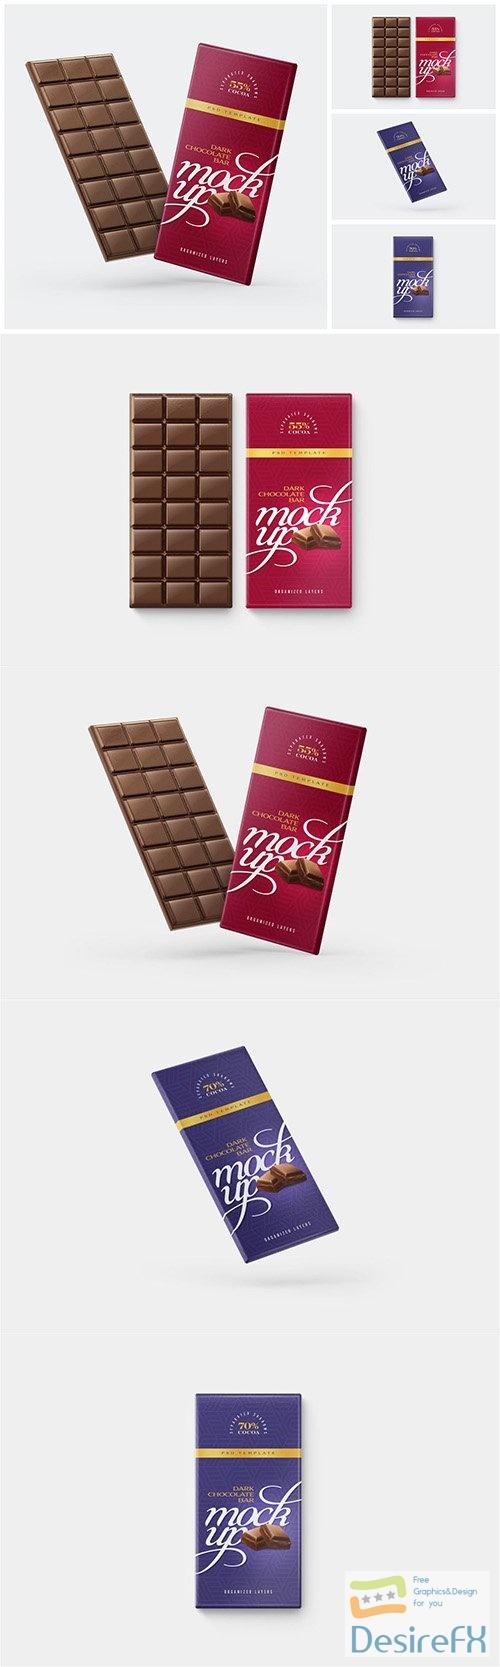 Chocolate Bar Mockup Set PSD